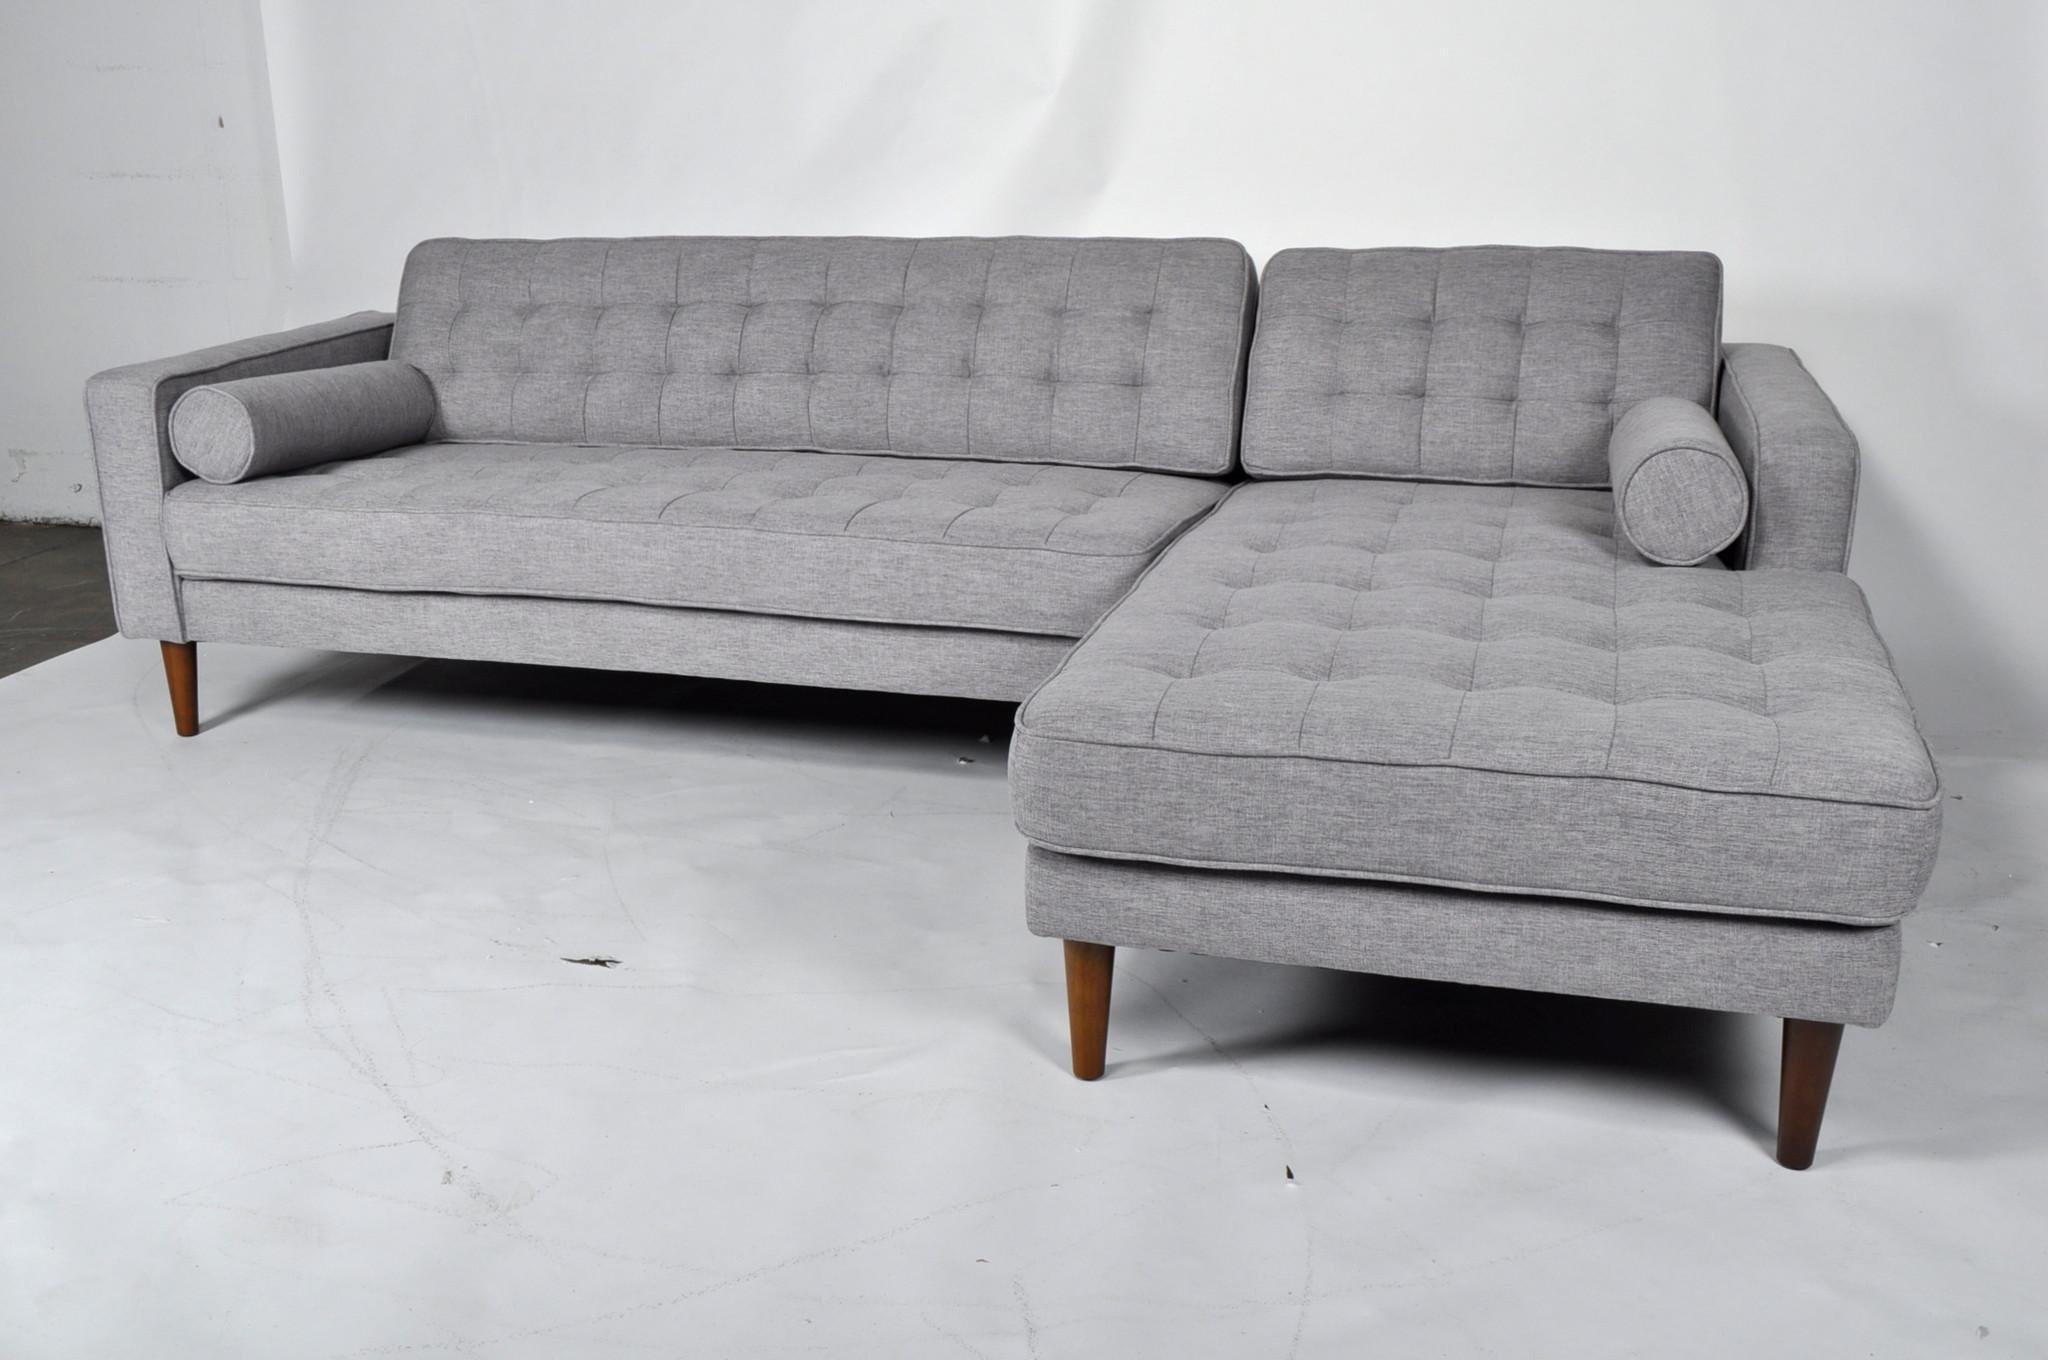 Bradley Sectional Sofa 11 With Bradley Sectional Sofa Pertaining To Bradley Sectional Sofas (View 5 of 20)